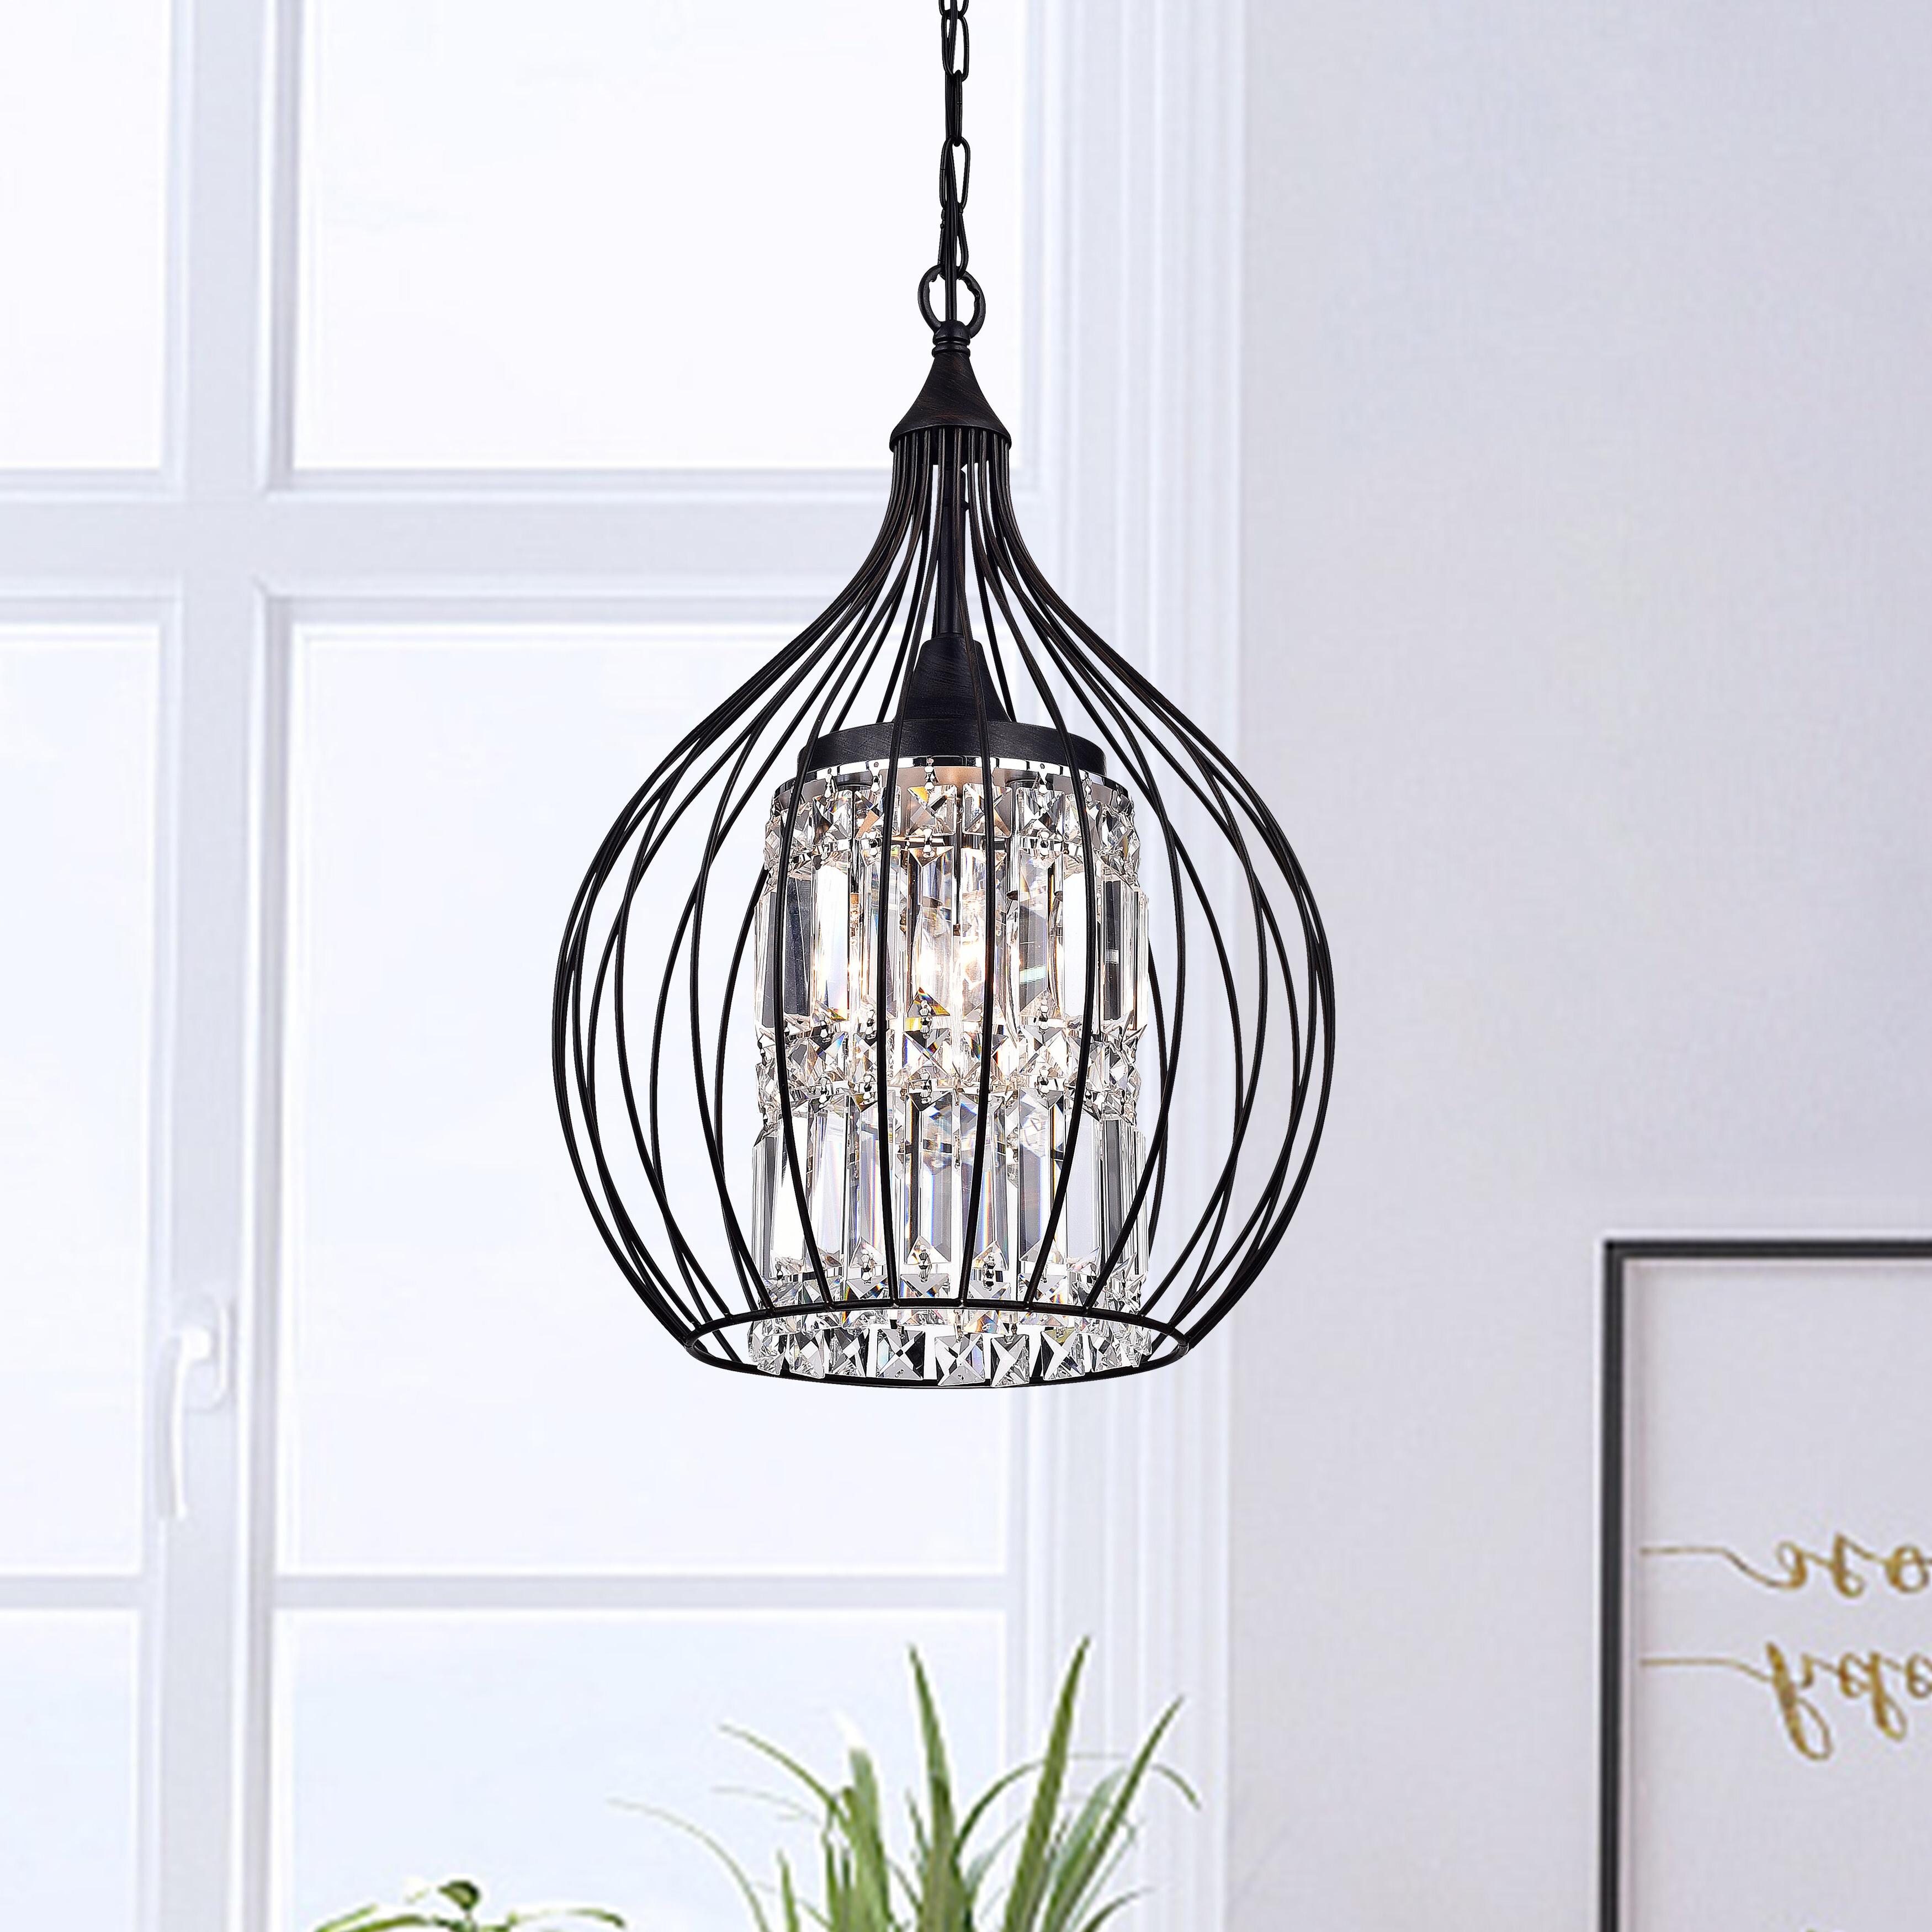 Richwood 3 Light Globe Chandelier Regarding Latest Alden 3 Light Single Globe Pendants (Gallery 16 of 20)